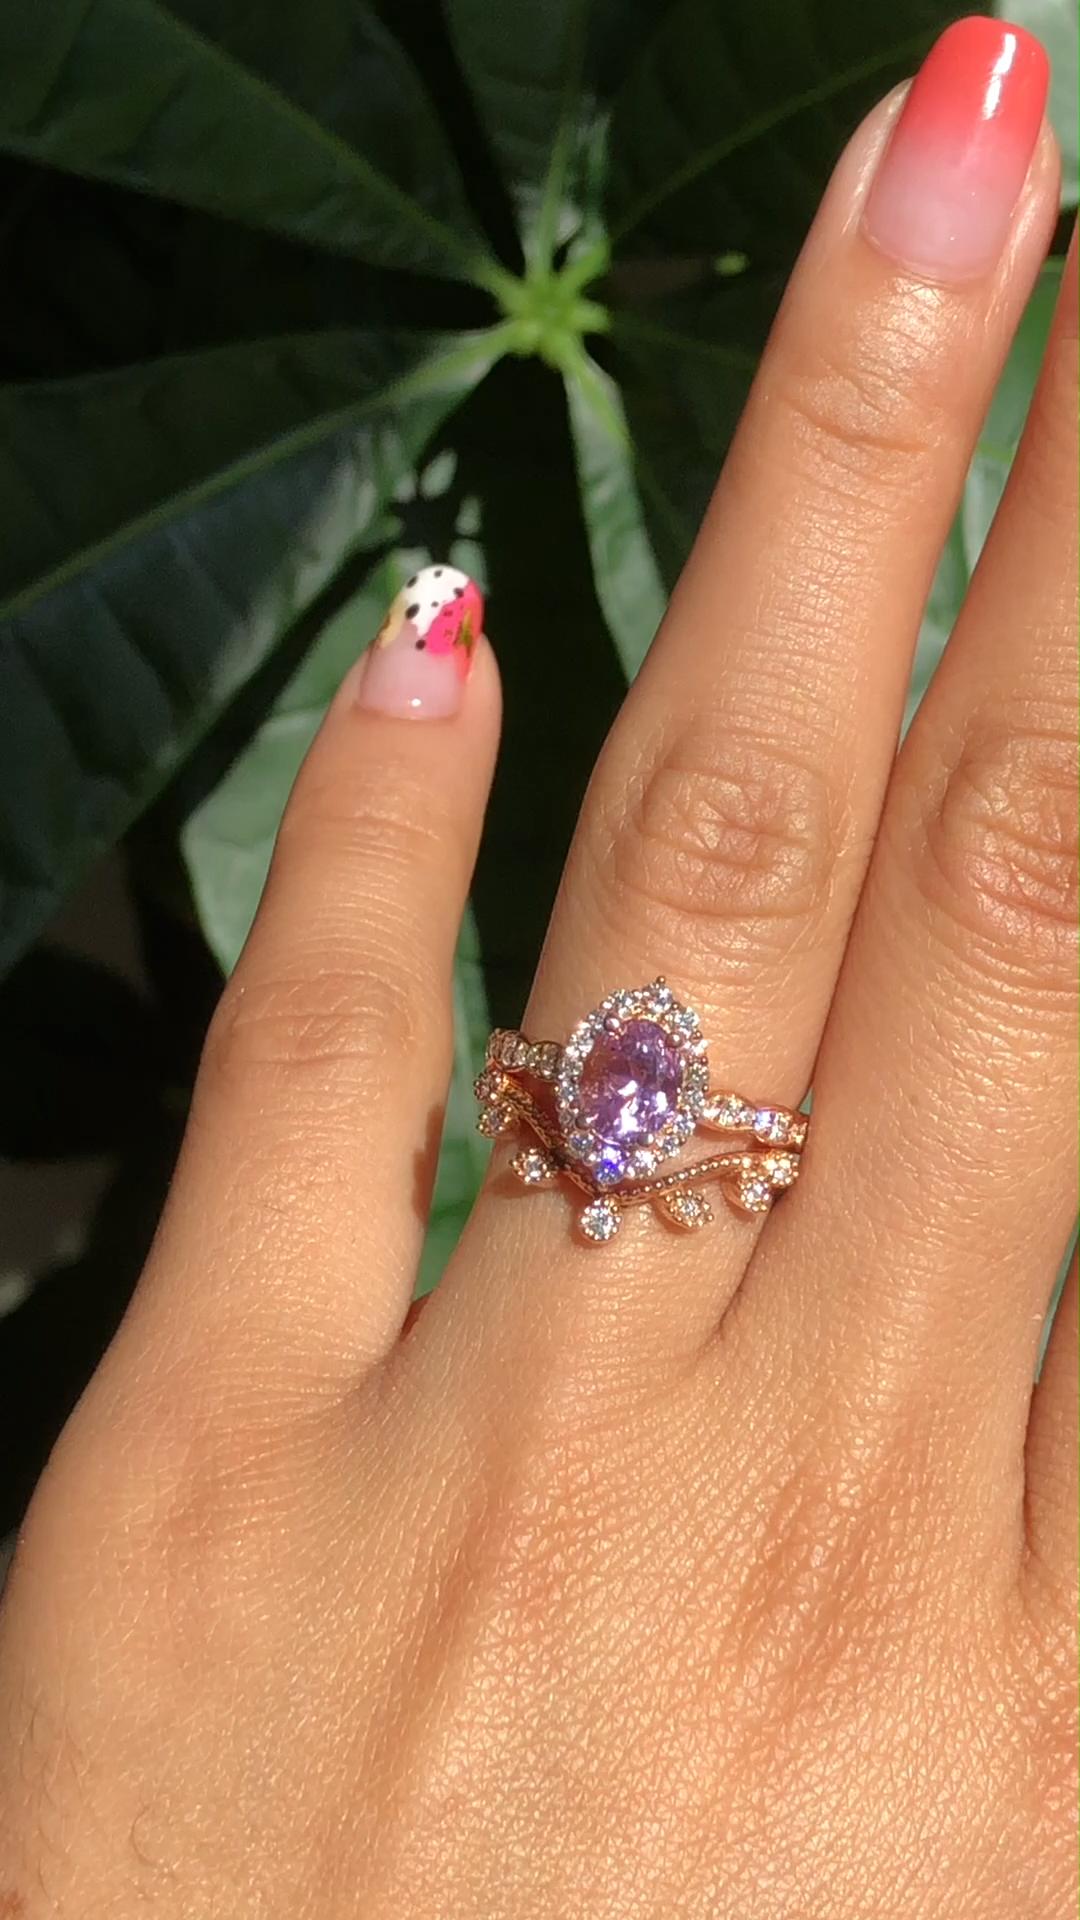 Halo Ruby Engagement Ring 14K White Gold Flower Ring 0